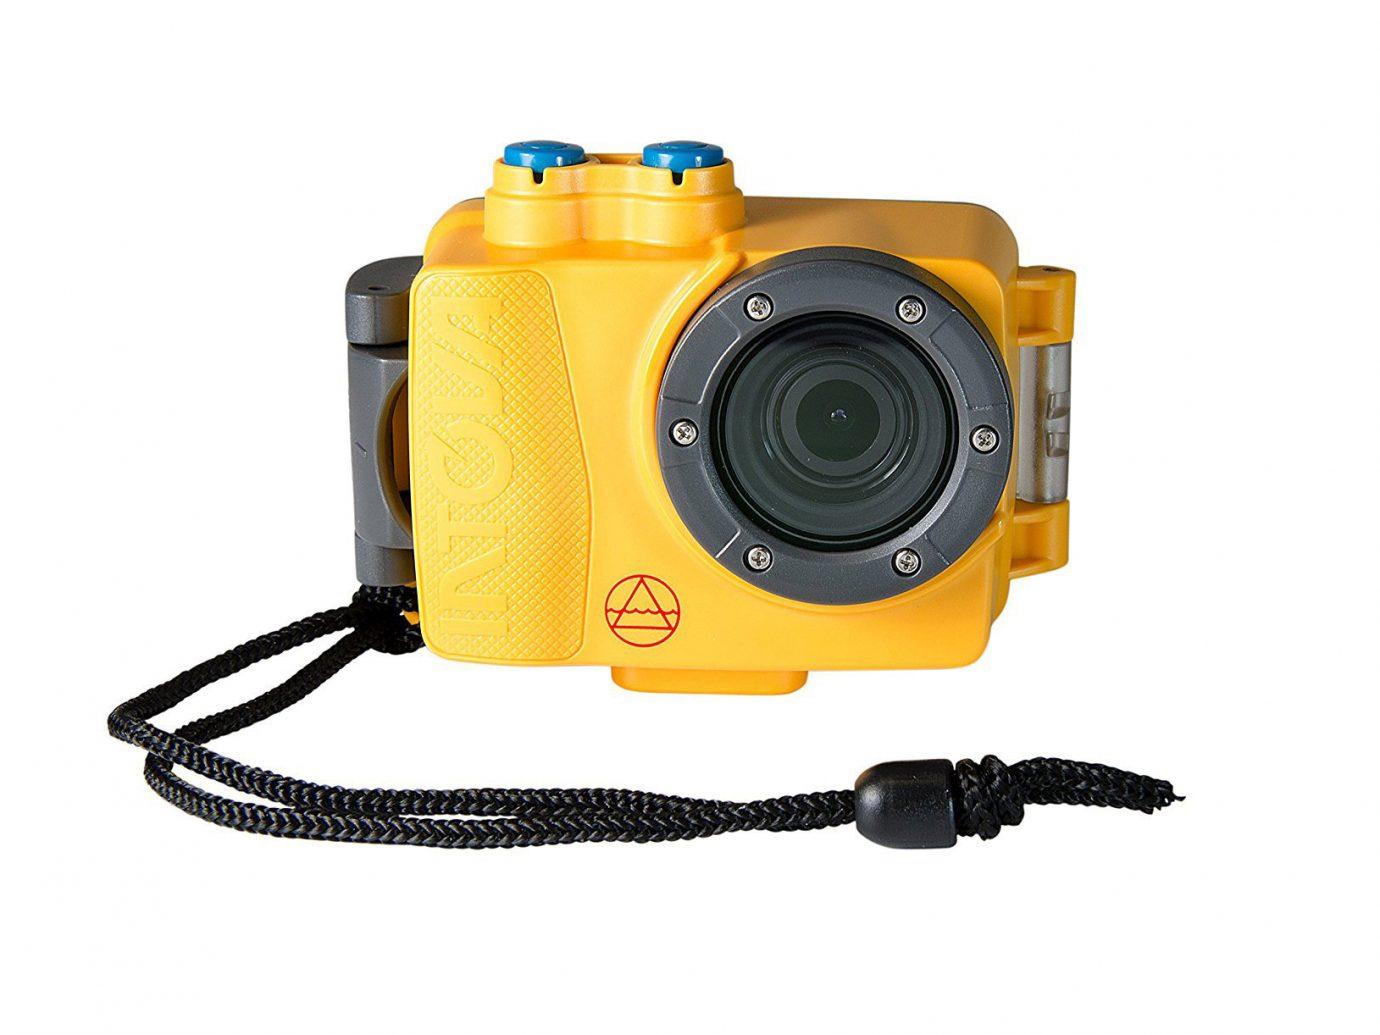 Travel Tips camera digital camera cameras & optics yellow electronics camera lens product